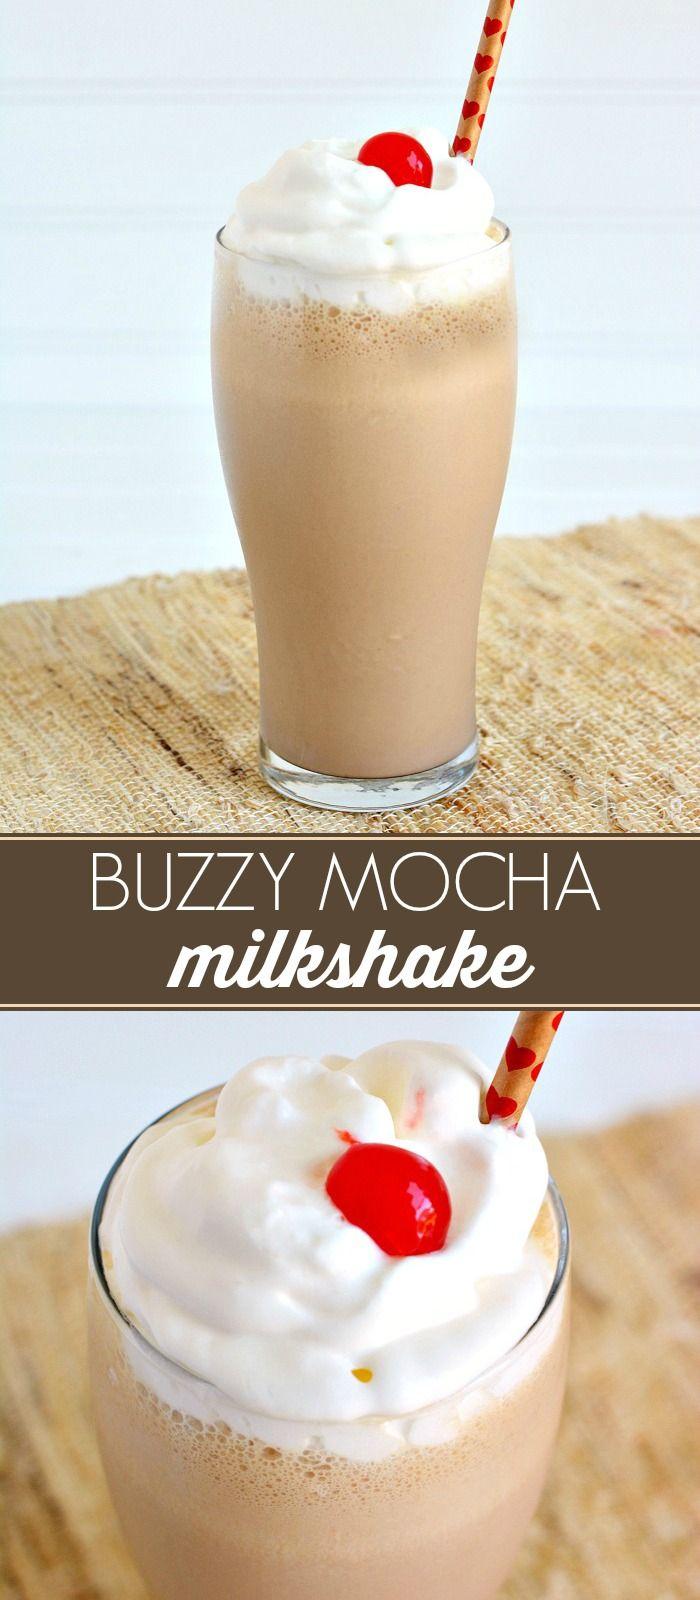 Buzzy Mocha Milkshake Recipe